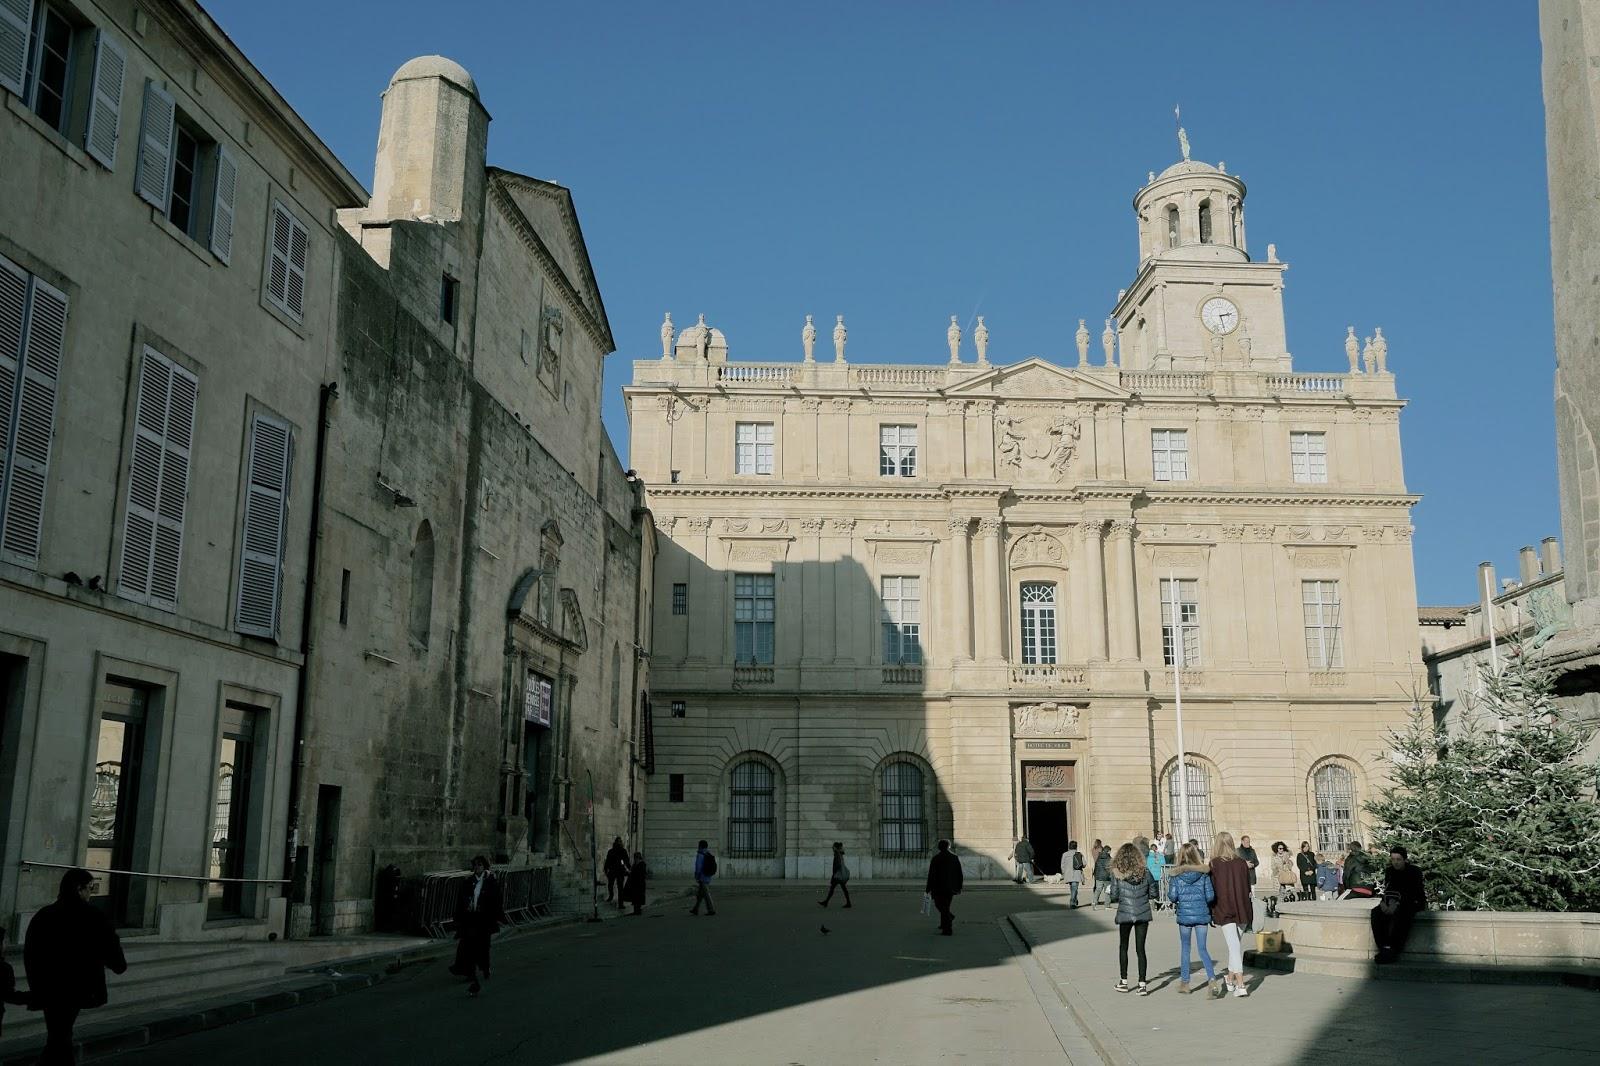 アルル市庁舎(Hôtel de ville d'Arles)